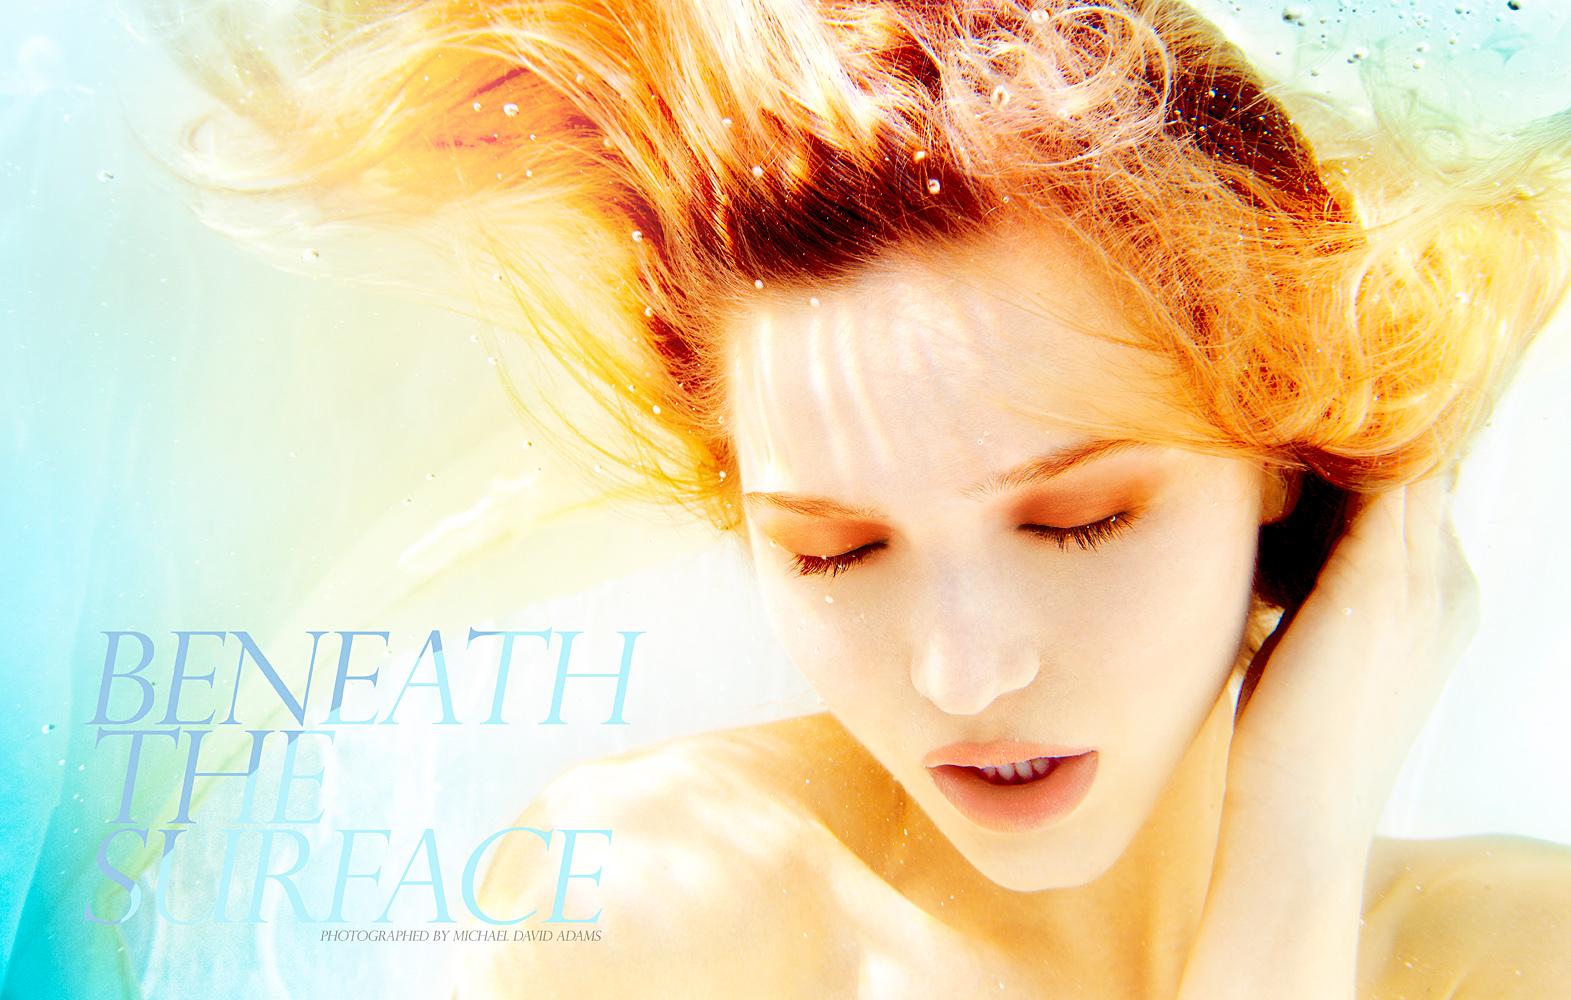 Beneath Surface Michael David Adams